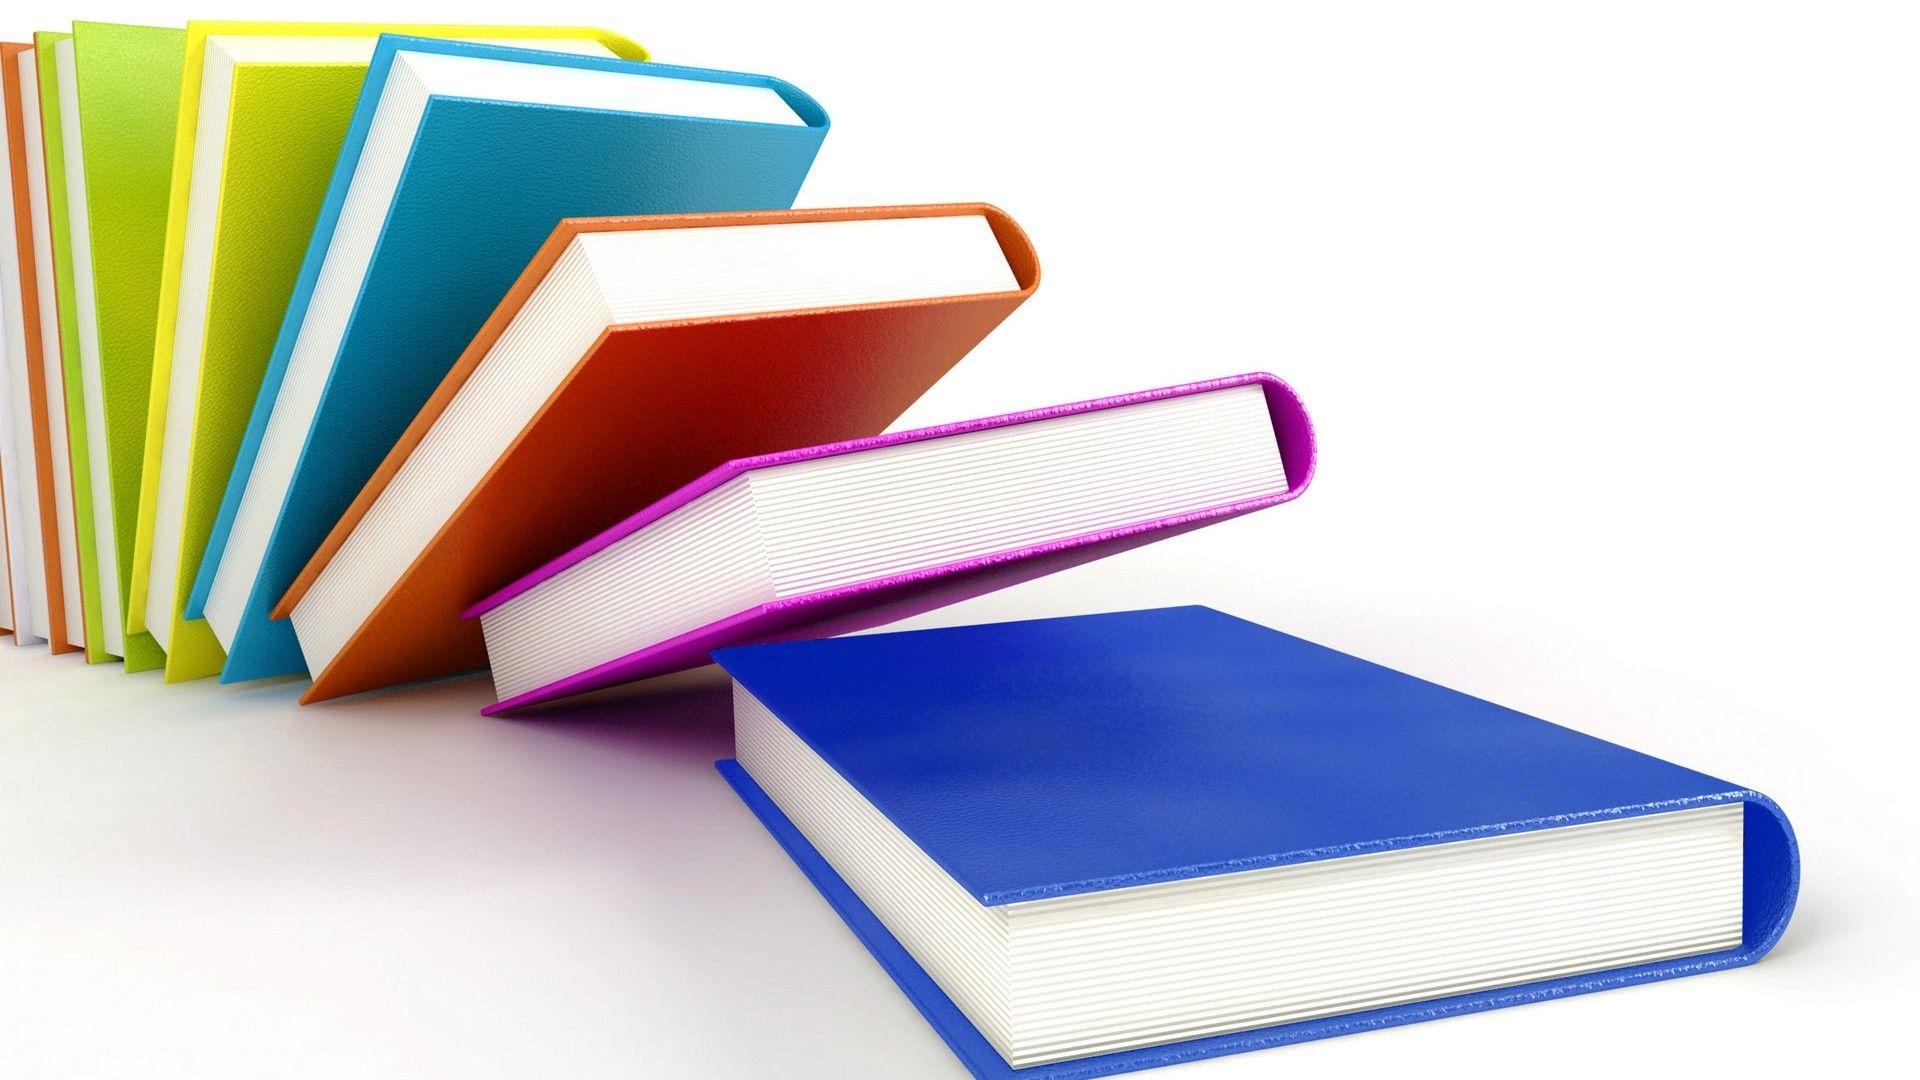 Hd wallpaper education - Hd Wallpaper Education 56